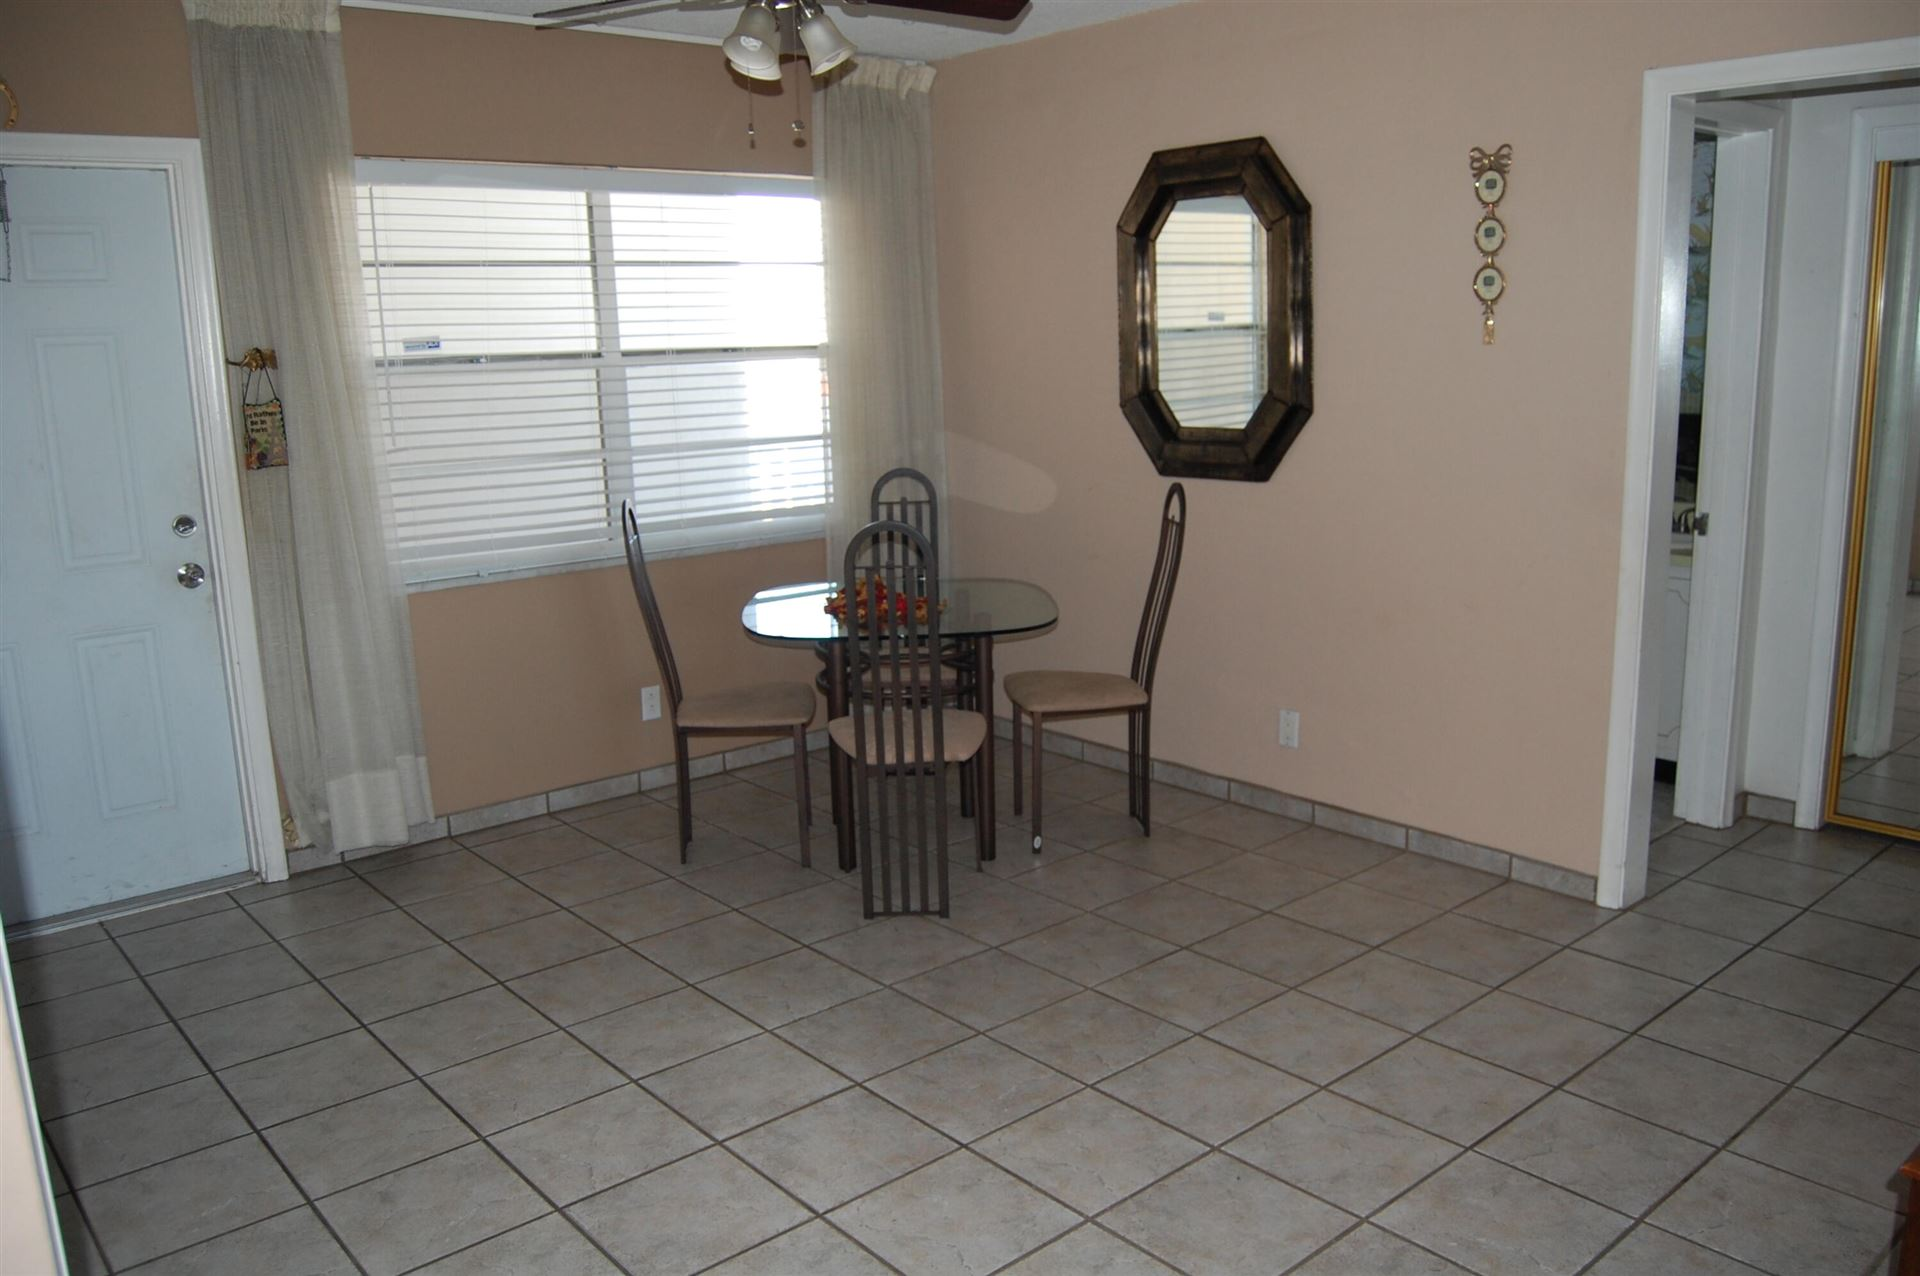 Photo of 1490 NW 43rd Avenue #309, Lauderhill, FL 33313 (MLS # RX-10694712)